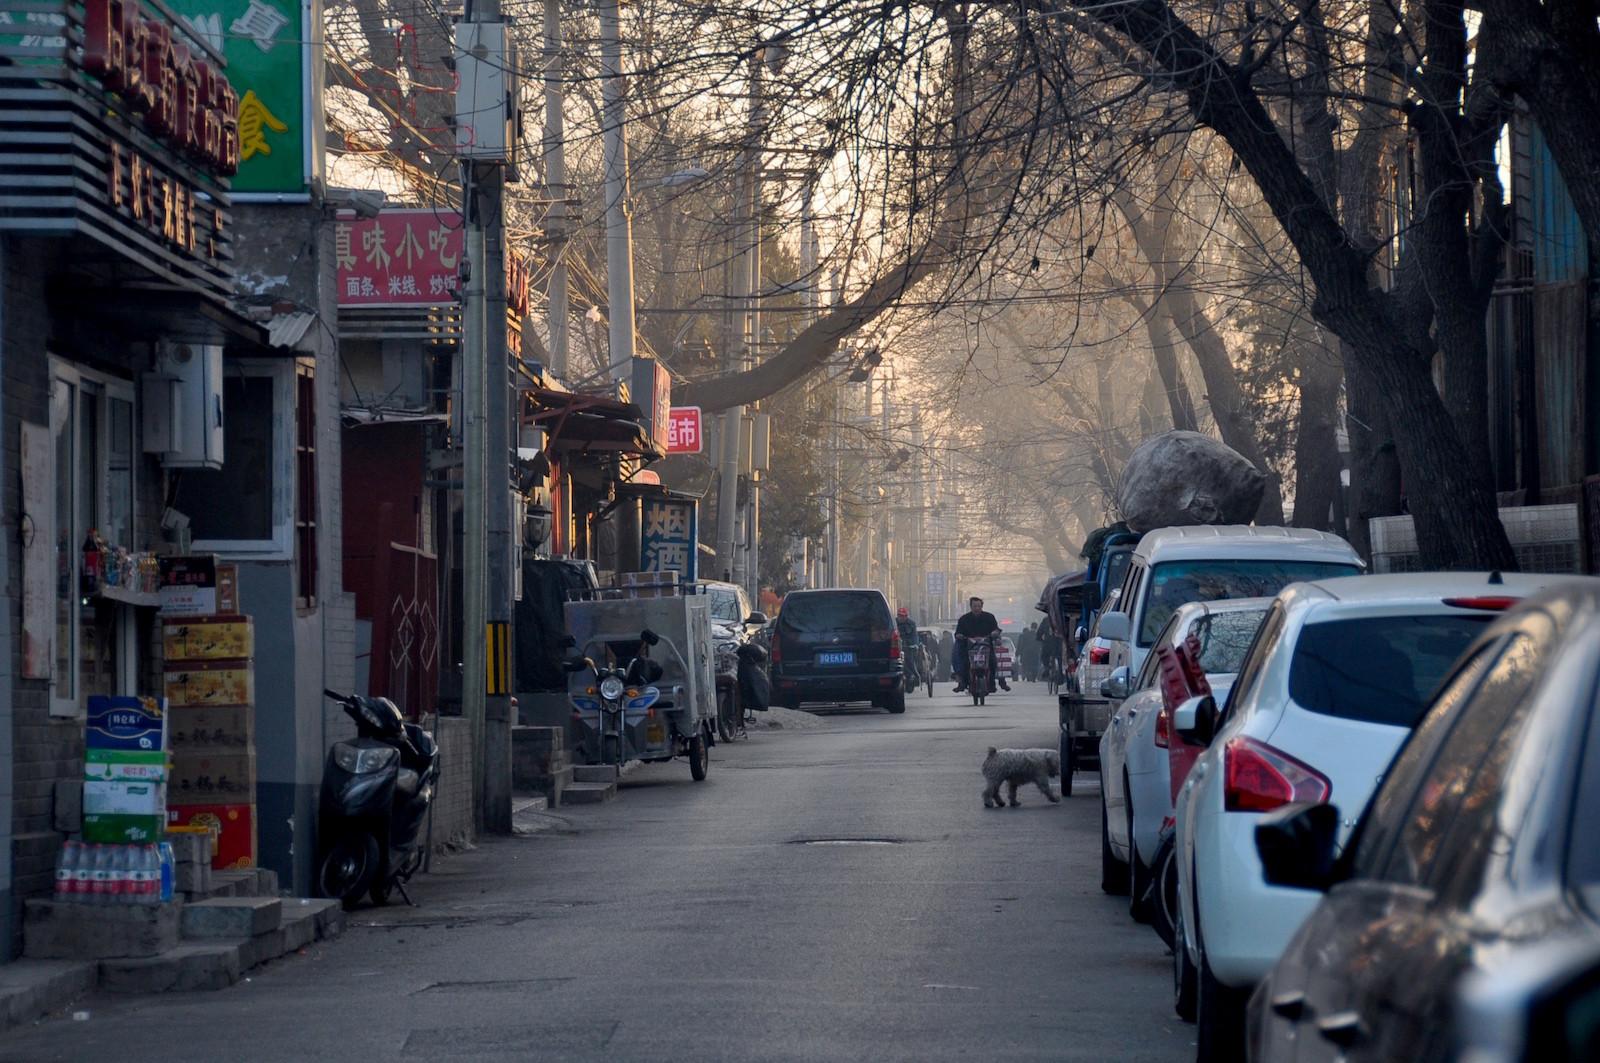 "<p>Пекин. Фото: &copy; Flickr/<a href=""https://www.flickr.com/photos/44534236@N00/"">faungg's photos</a></p>"